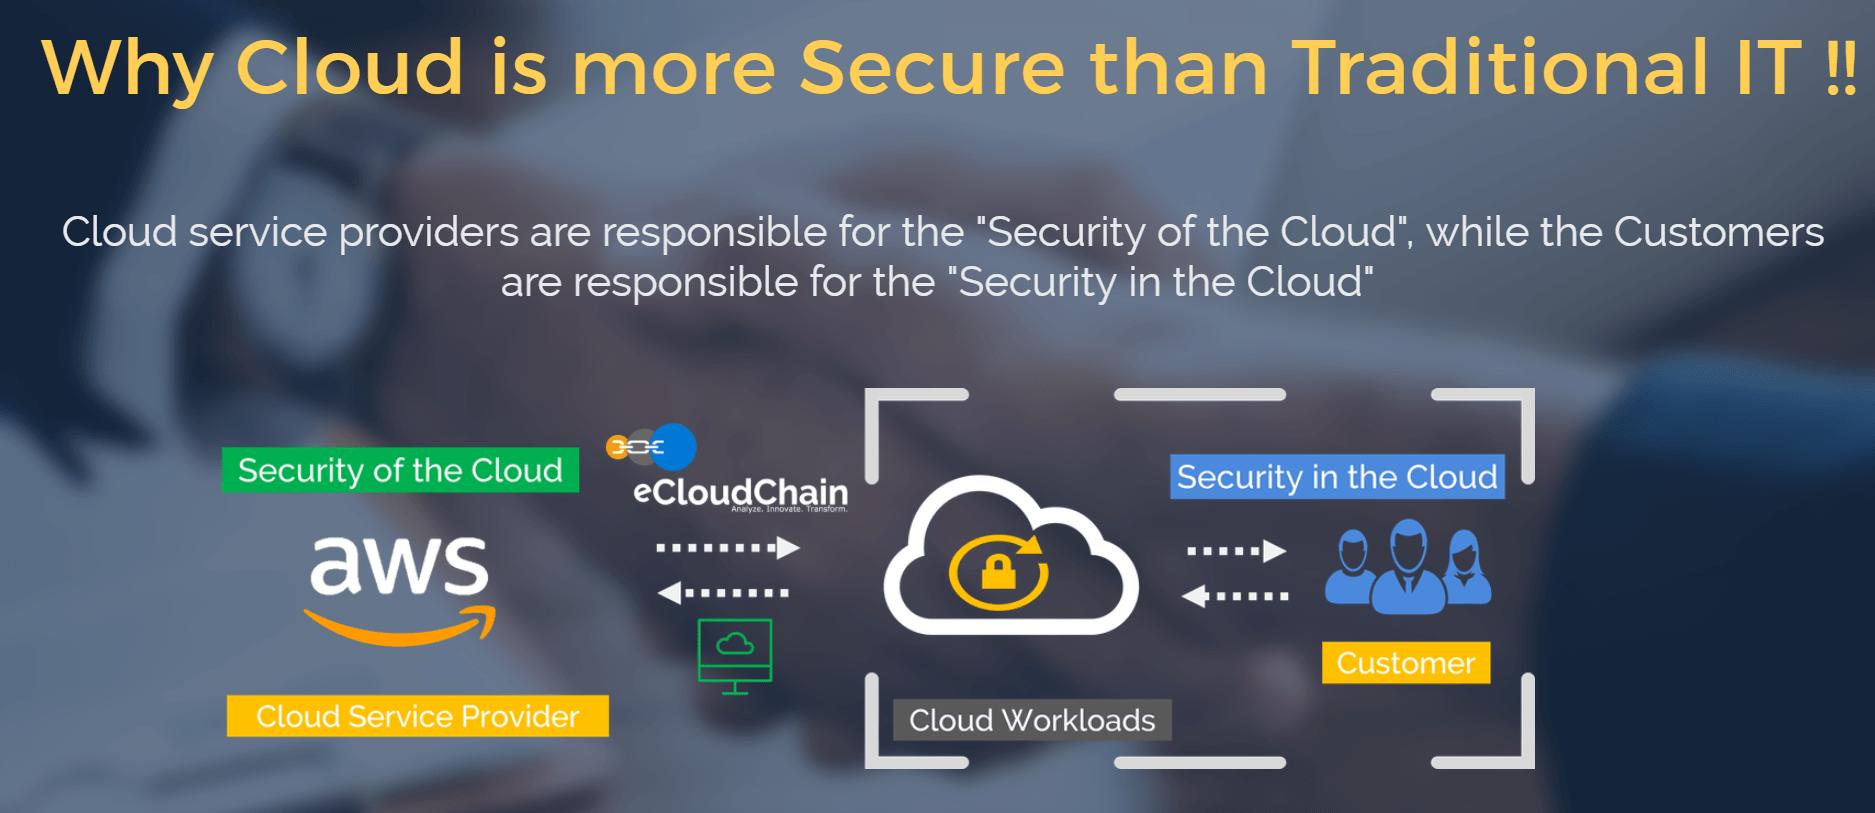 eCloudChain Cloud Security